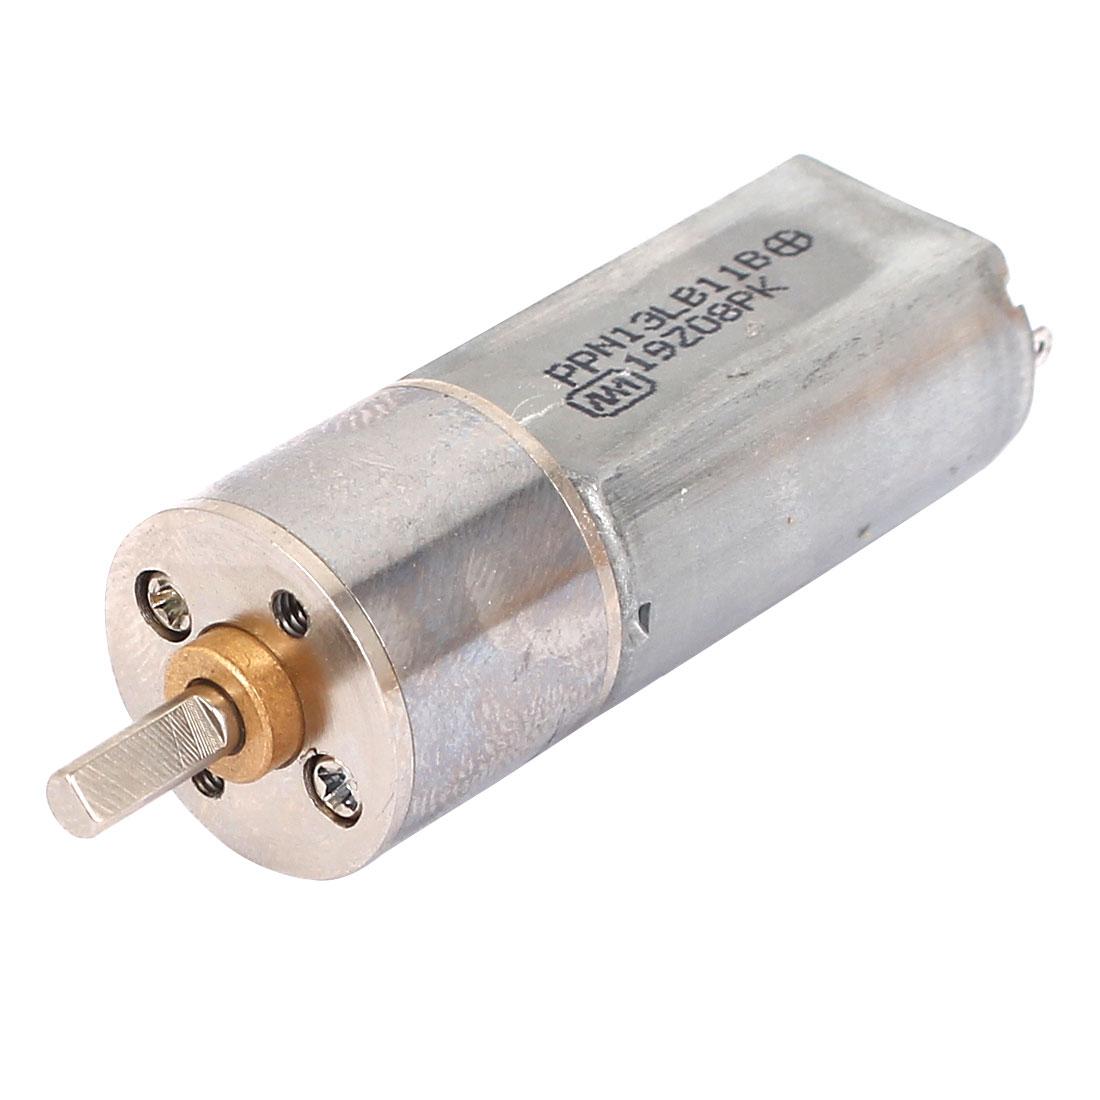 16GA 6V 200RPM Gear Motor Electric Gear Box Motor